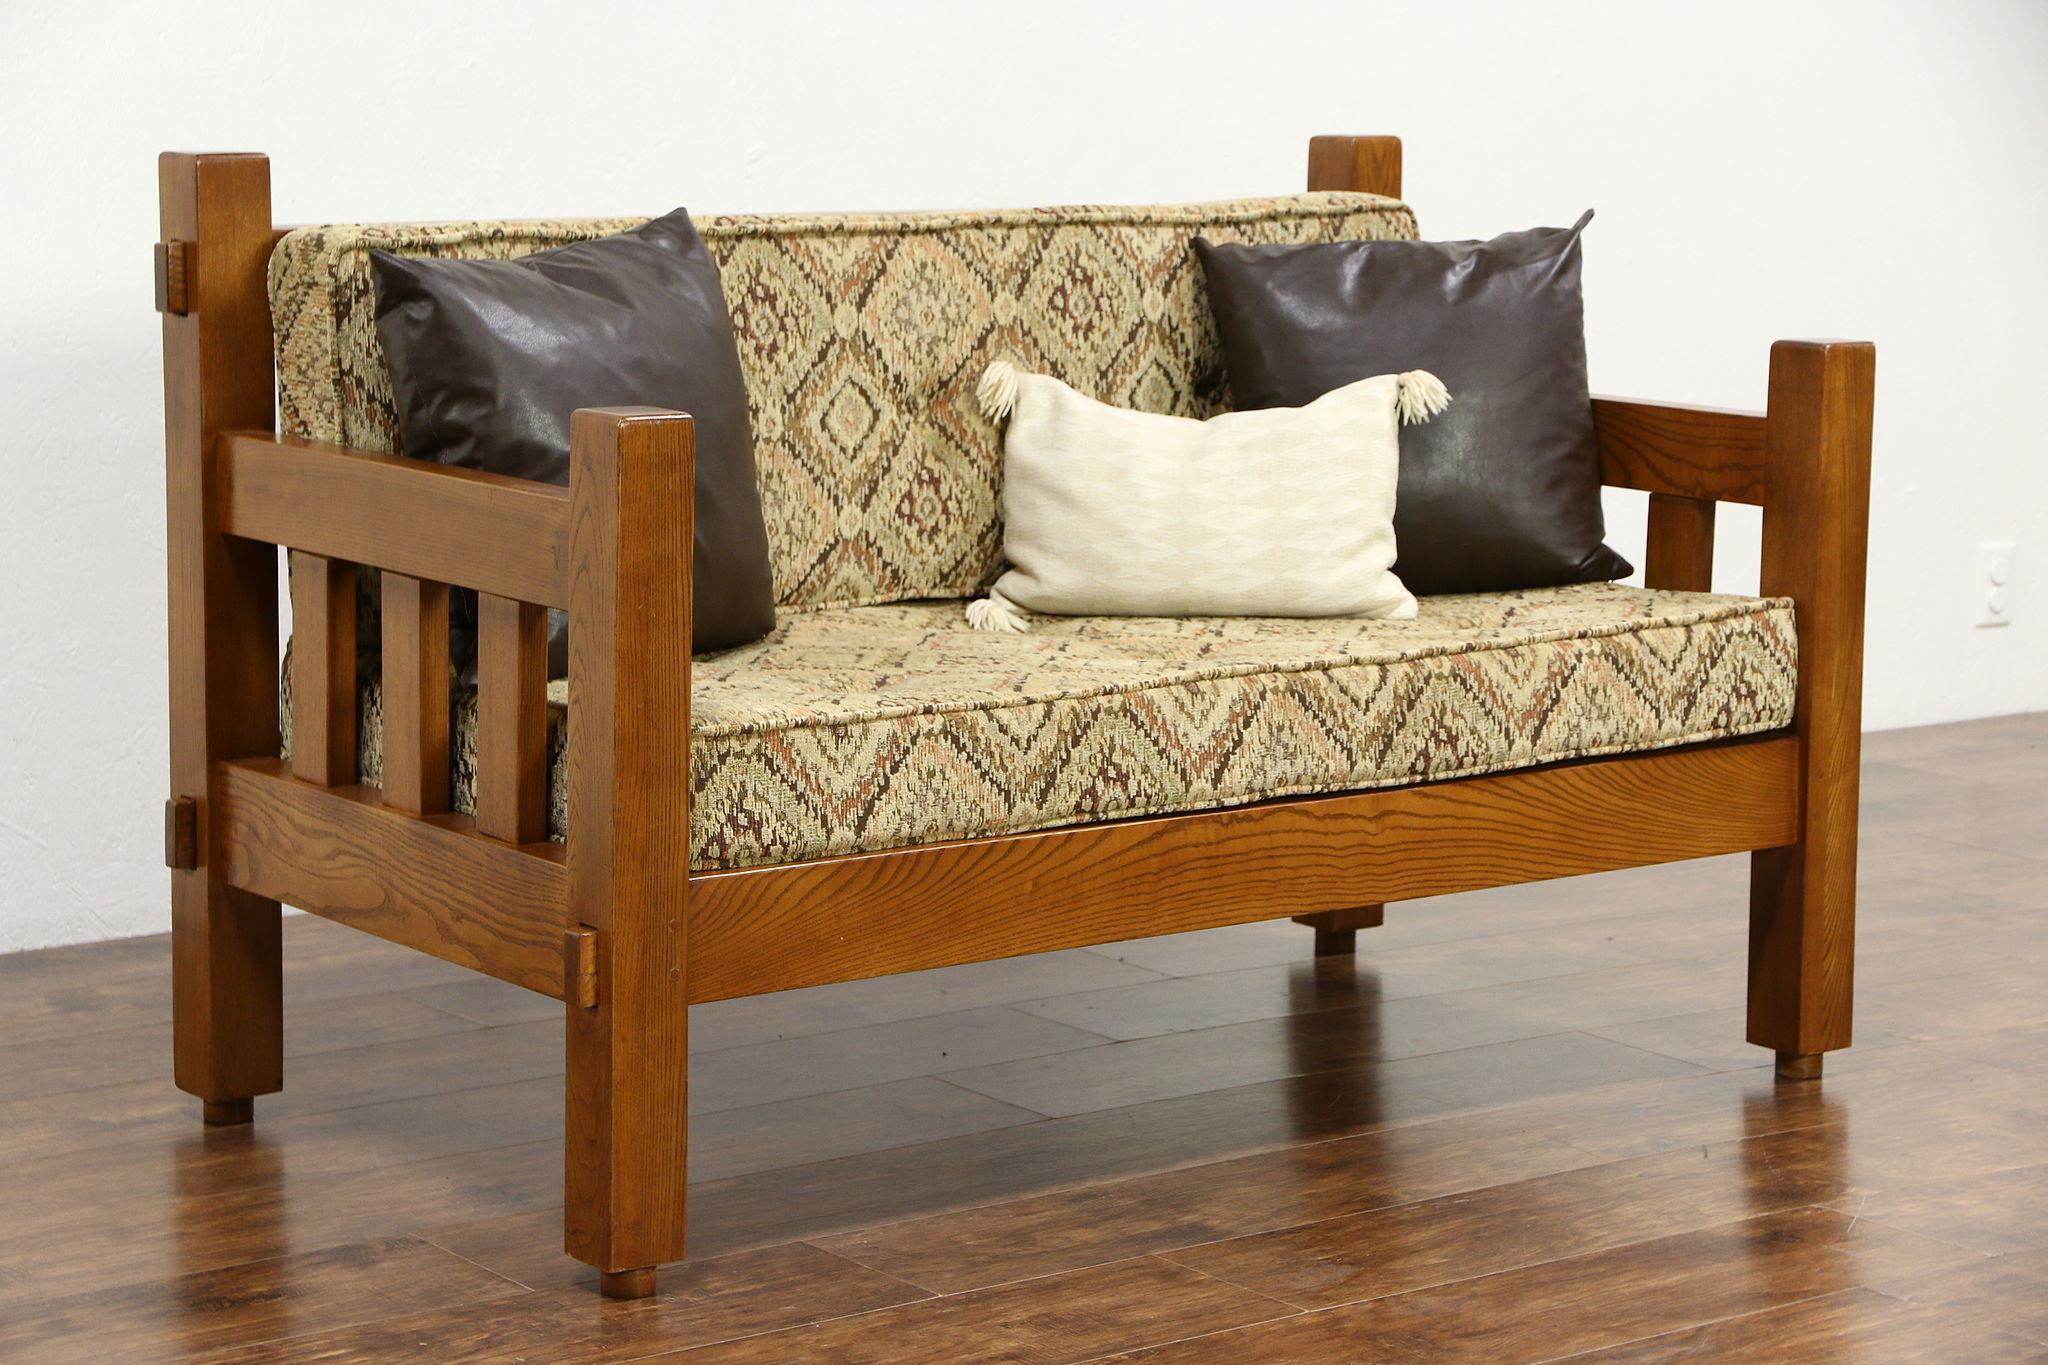 Astonishing Arts Crafts Mission Oak 1994 Vintage Loveseat Craftsman Settee New Upholstery Uwap Interior Chair Design Uwaporg